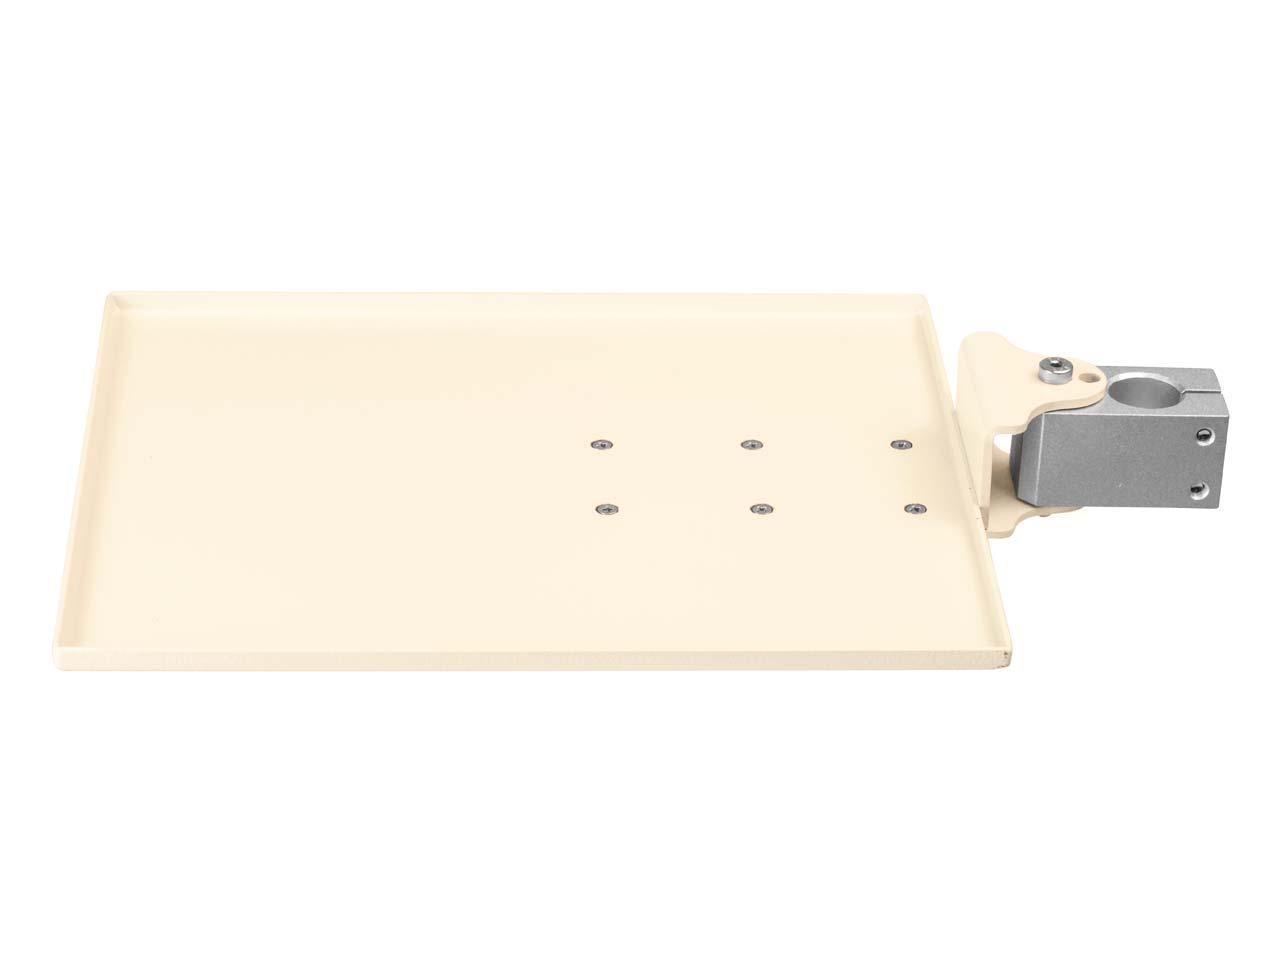 Genuine-US-Foredom-Workbench-Accessories-System miniatura 38